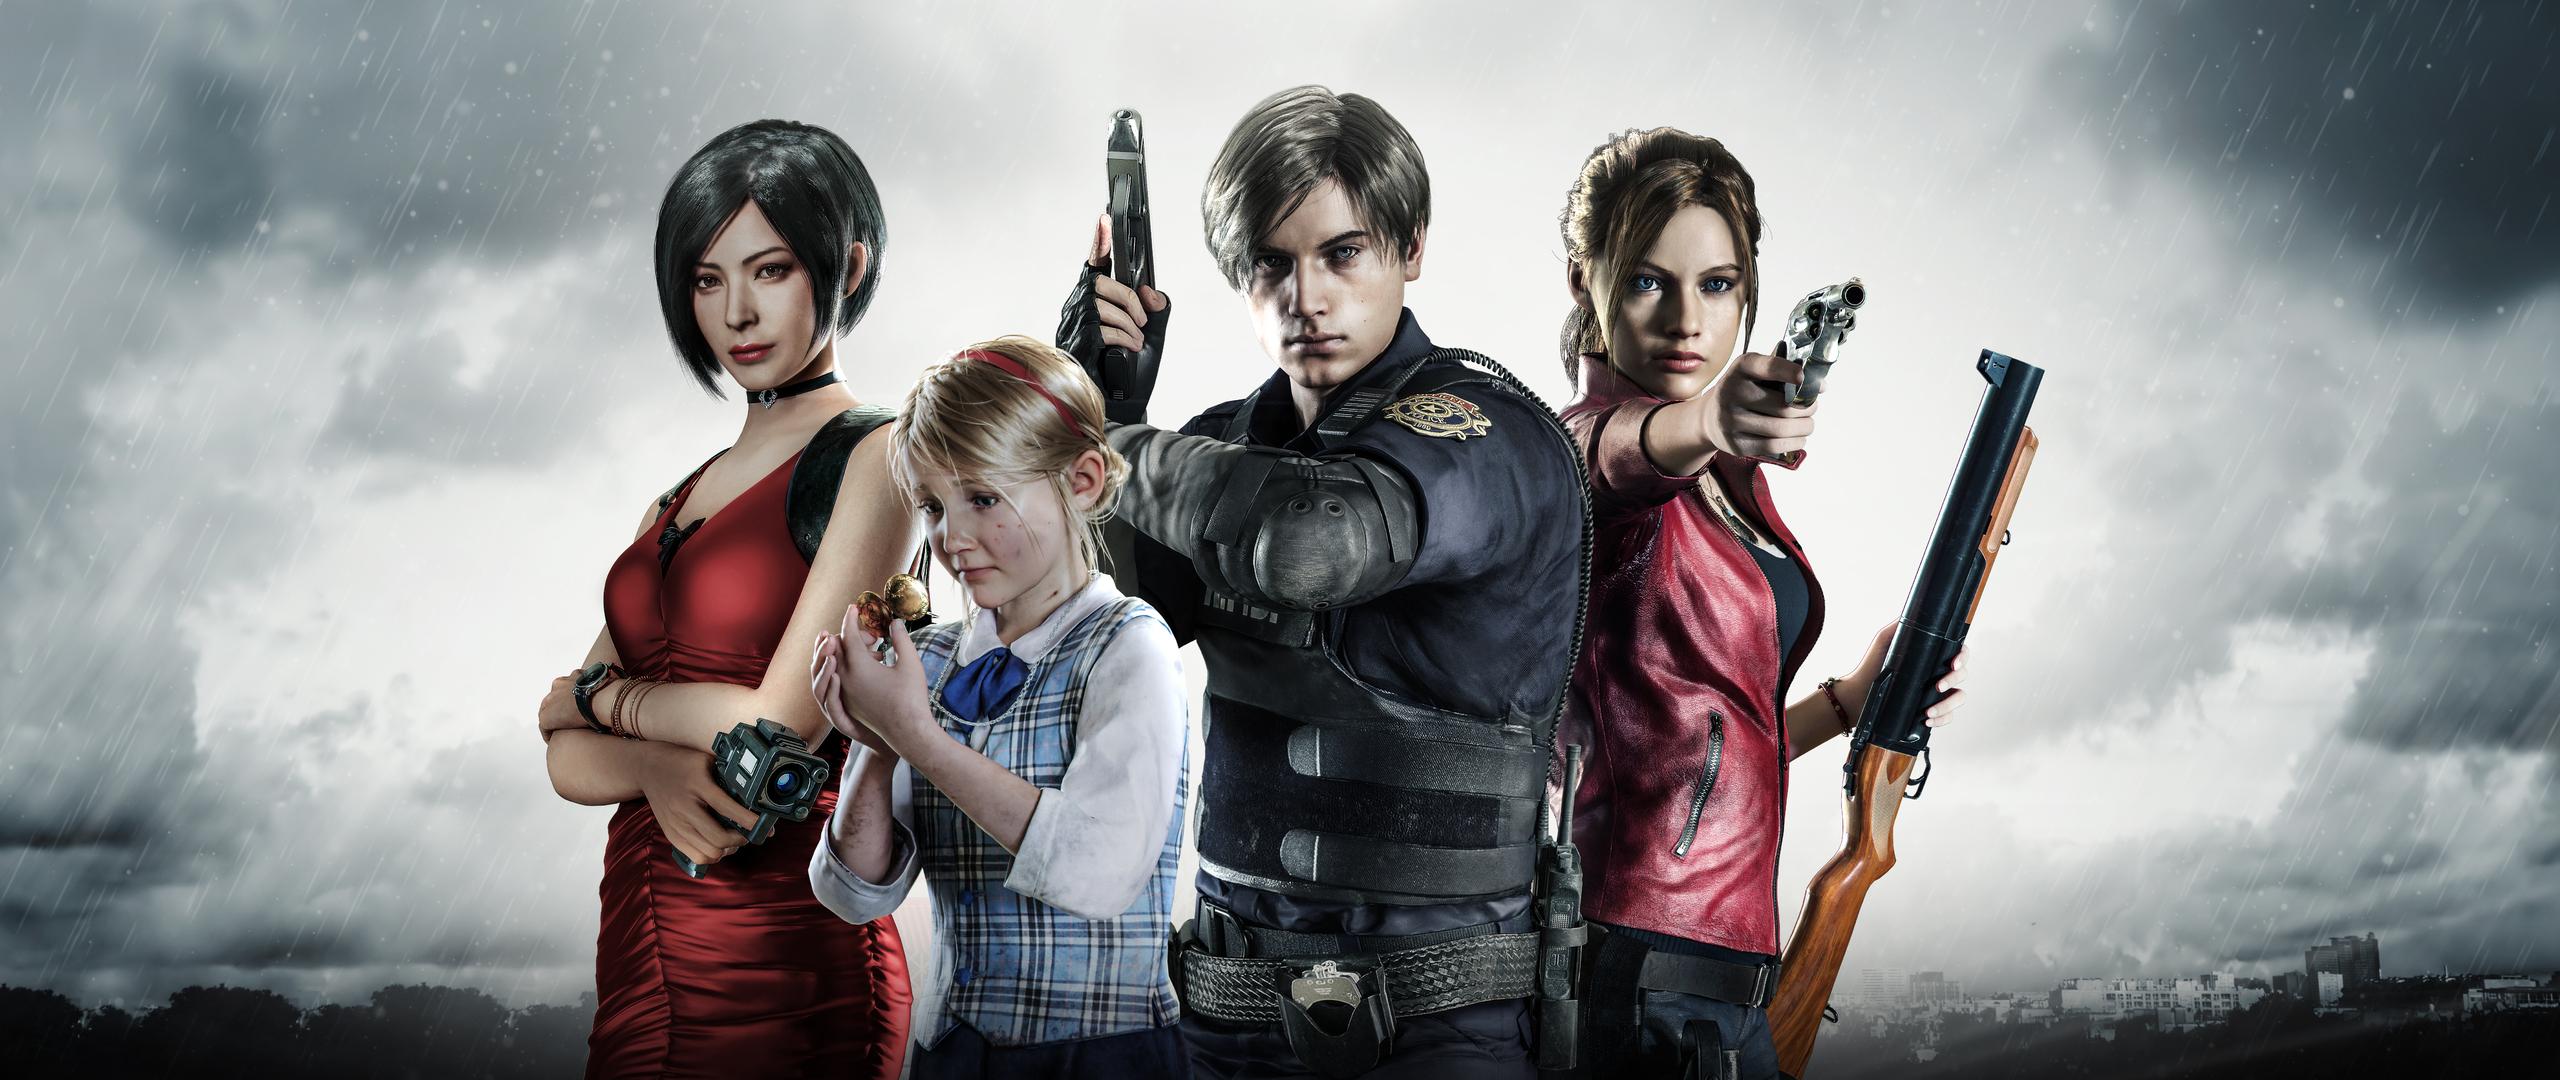 2560x1080 Resident Evil 2 2019 10k 2560x1080 Resolution HD ...